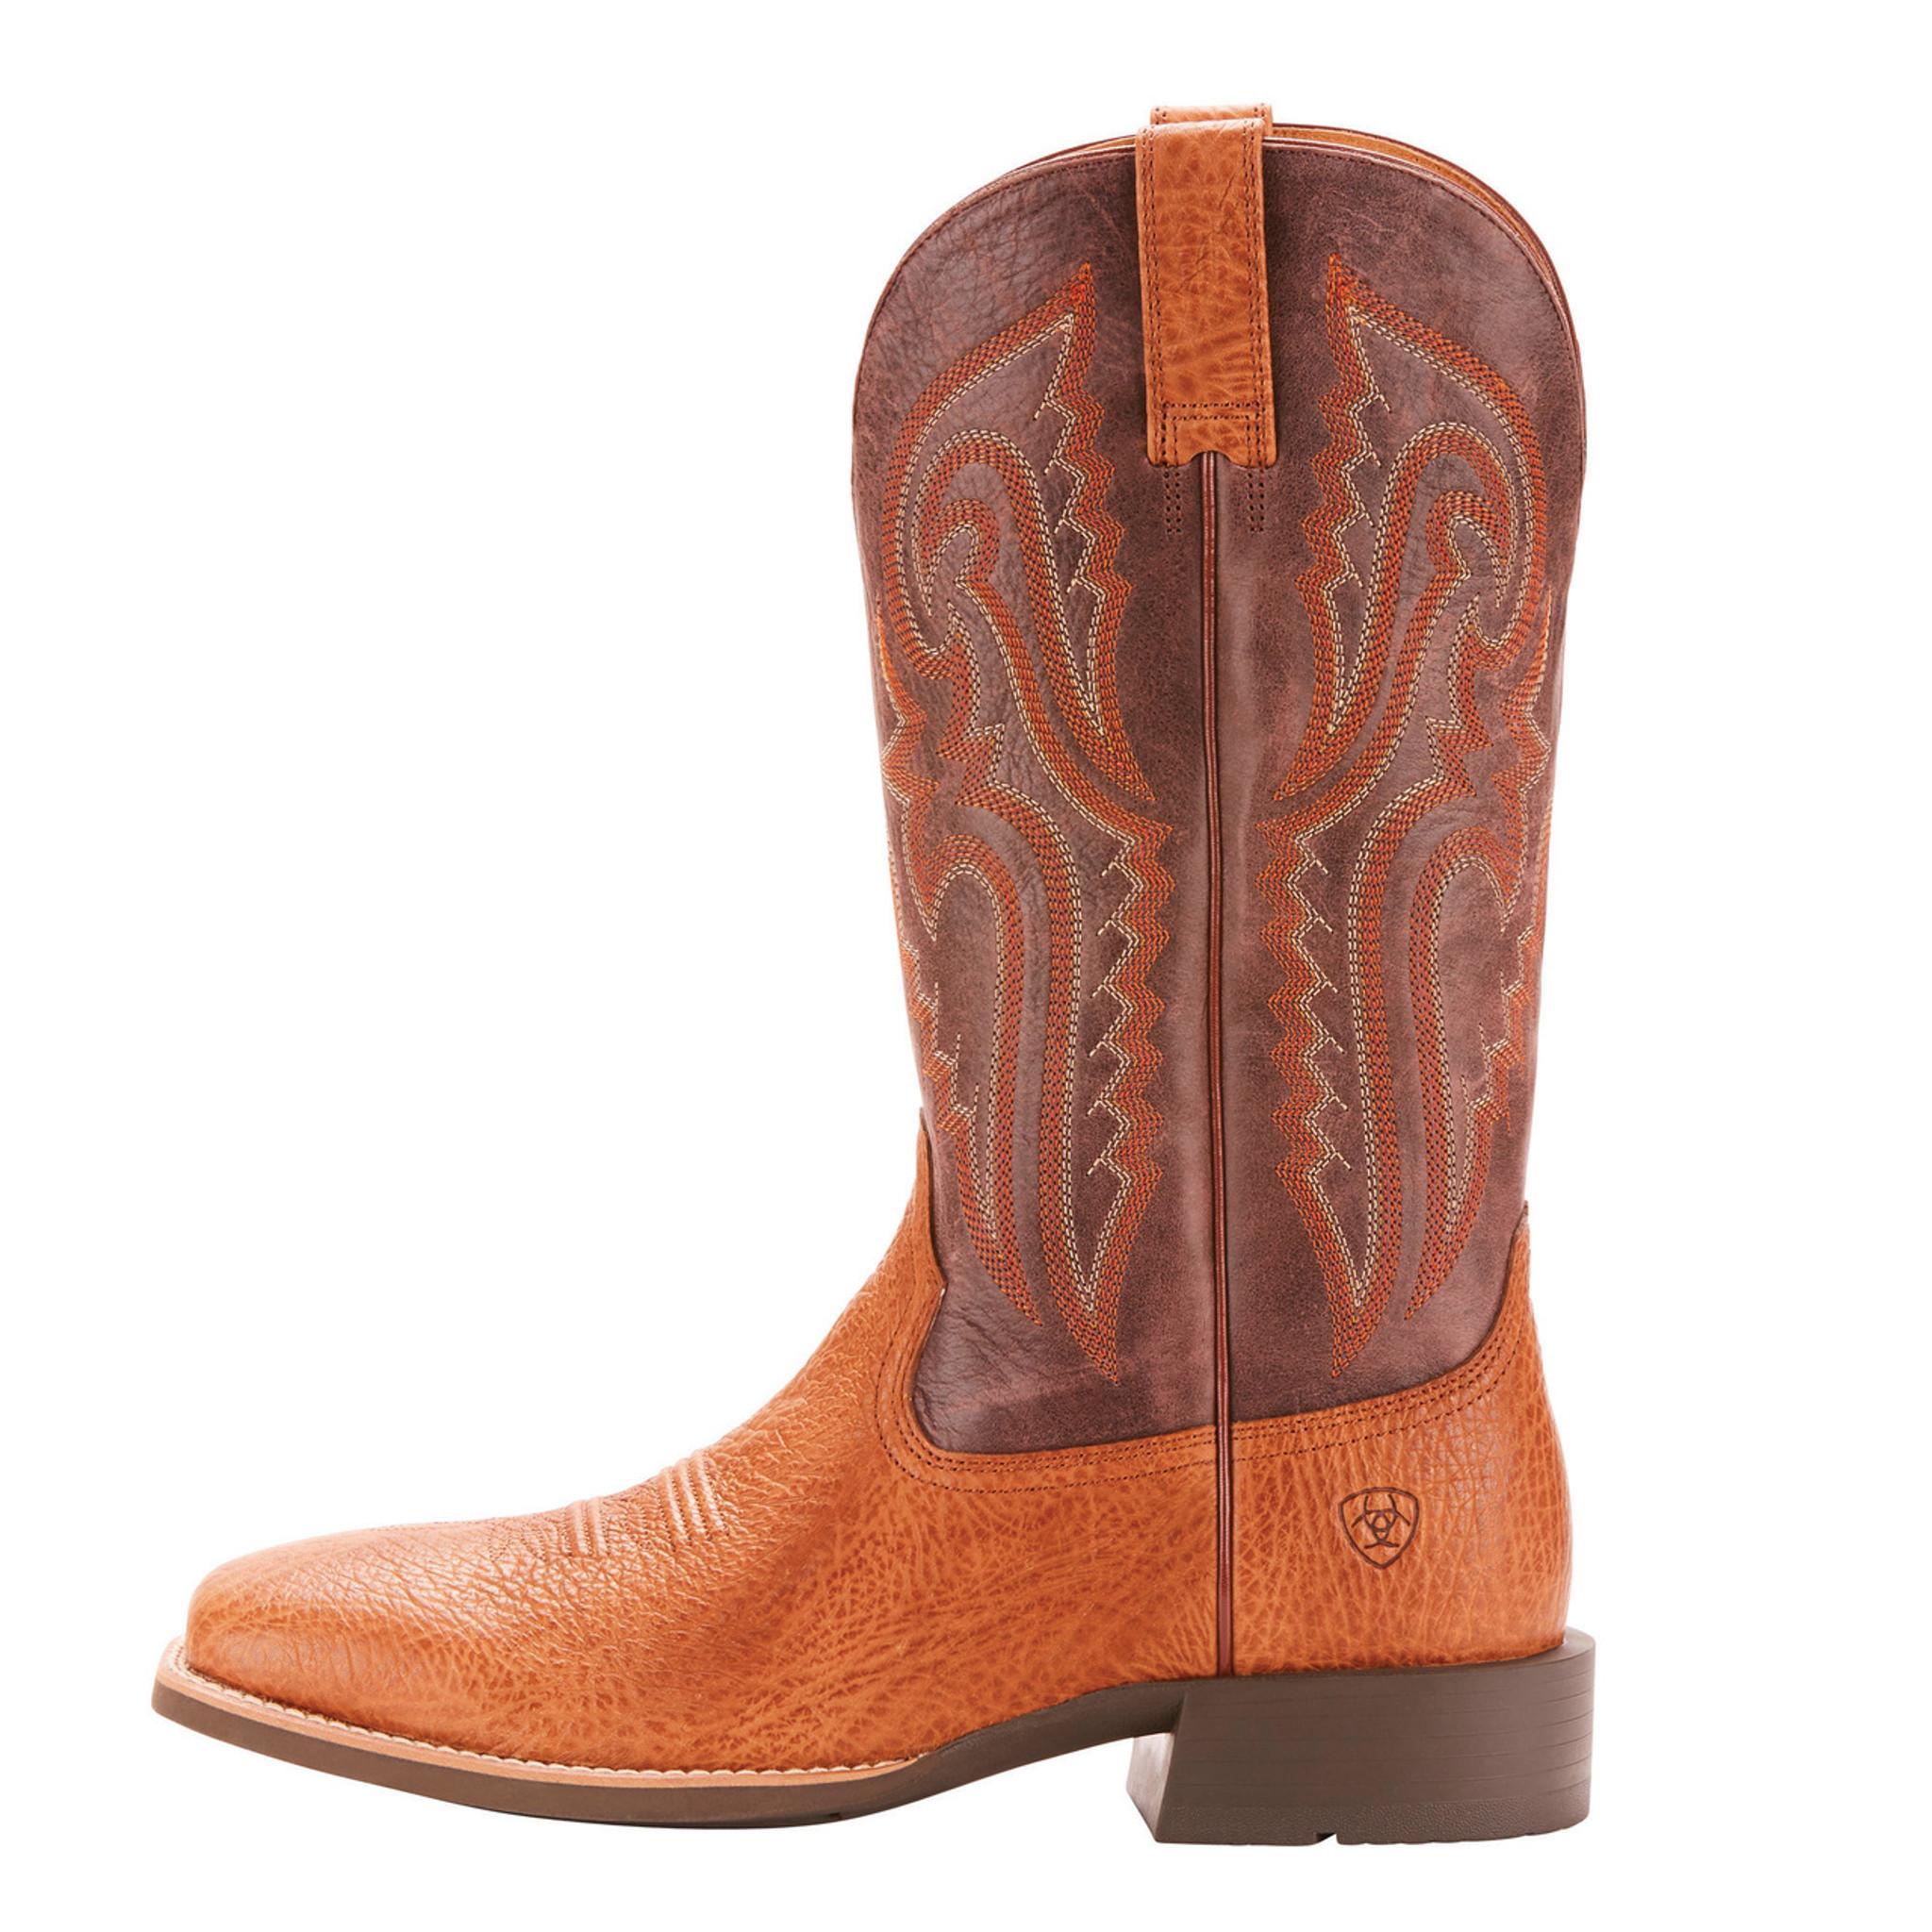 SALE Ariat Men/'s Tan Bullhide Brown Heritage Latigo Square Toe Boots 10025097